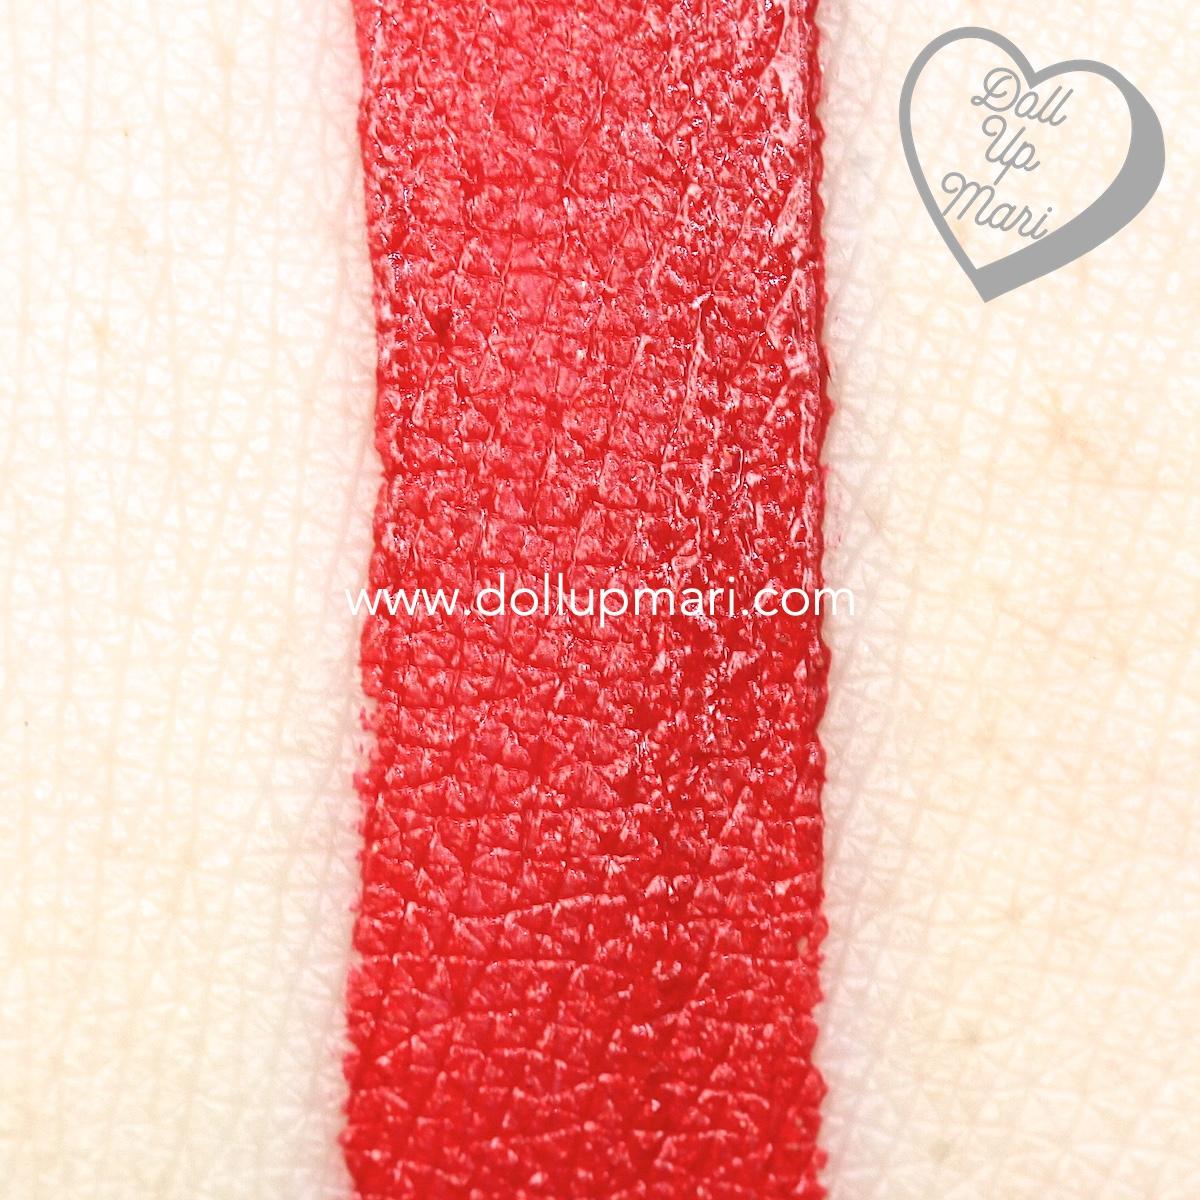 swatch of SilkyGirl Matte Junkie Lipcolor (09 Rouge)